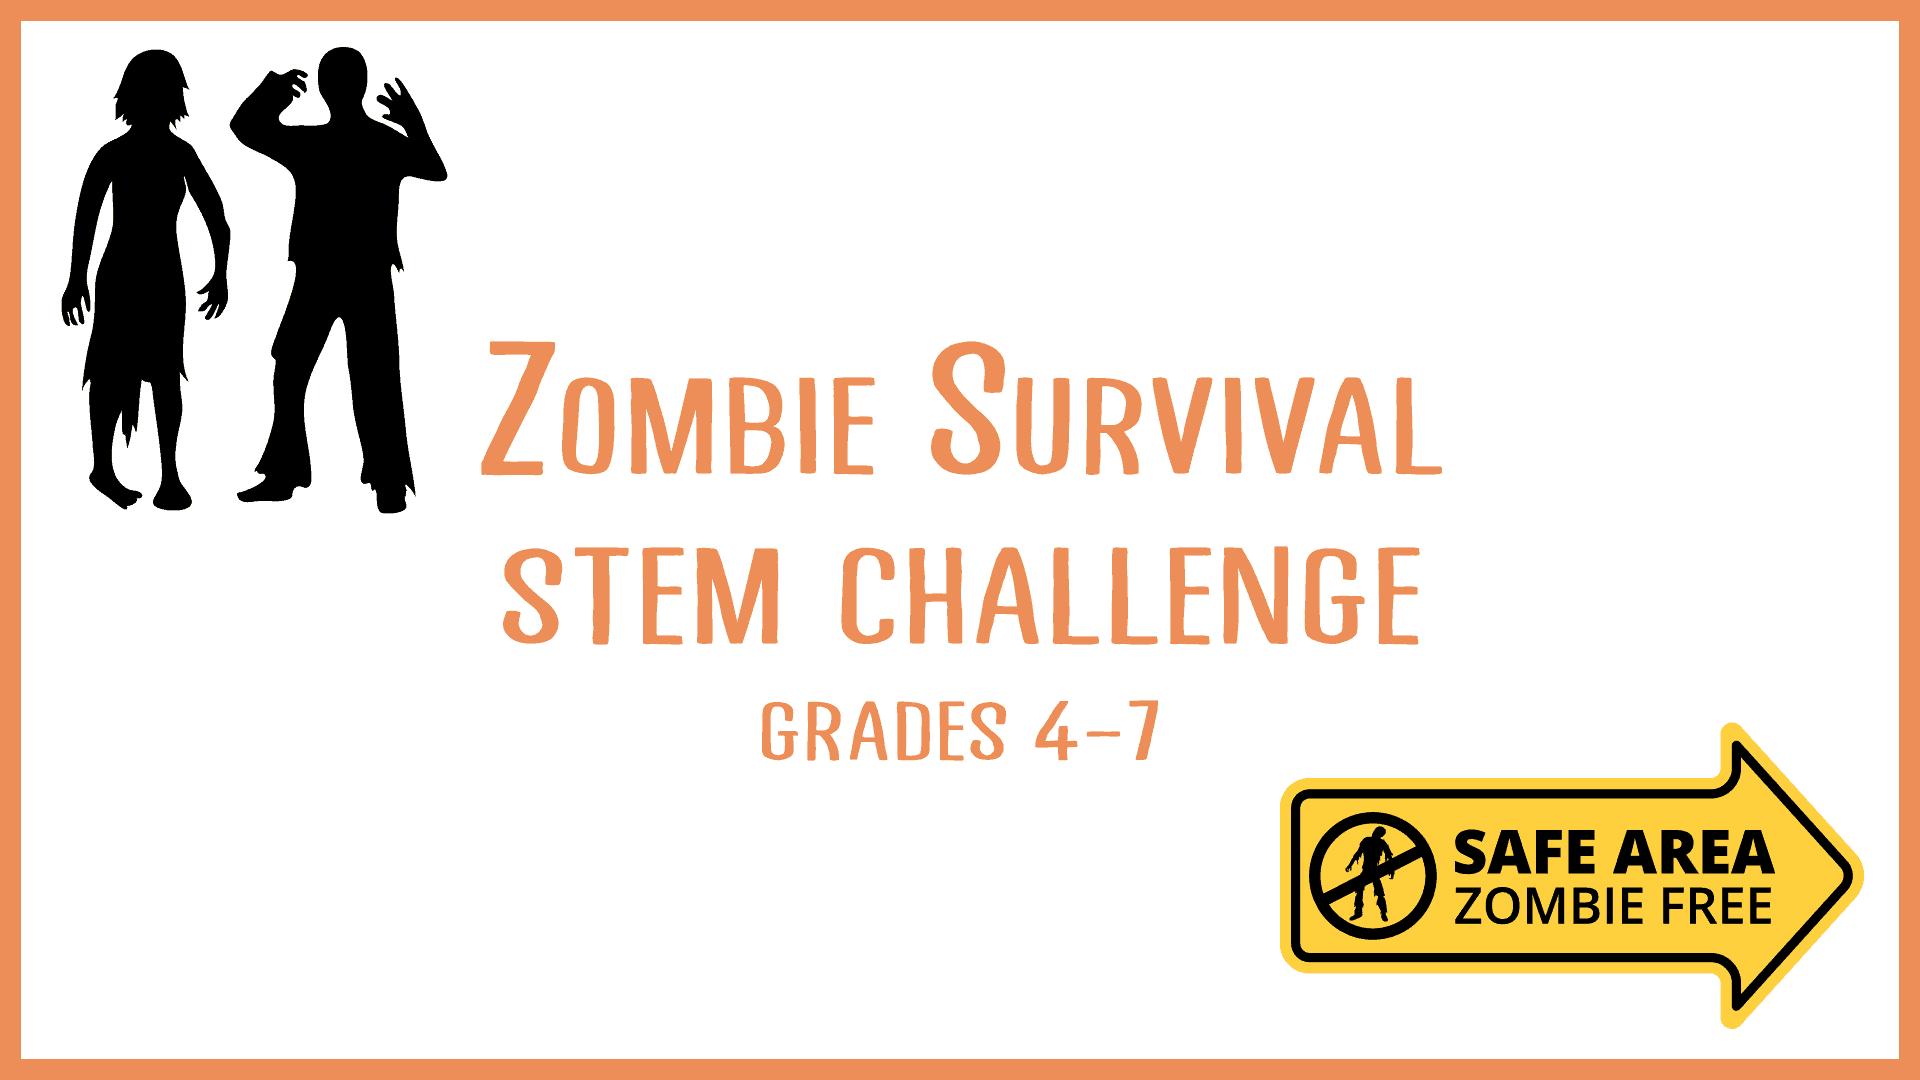 Zombie Survival STEM Challenge